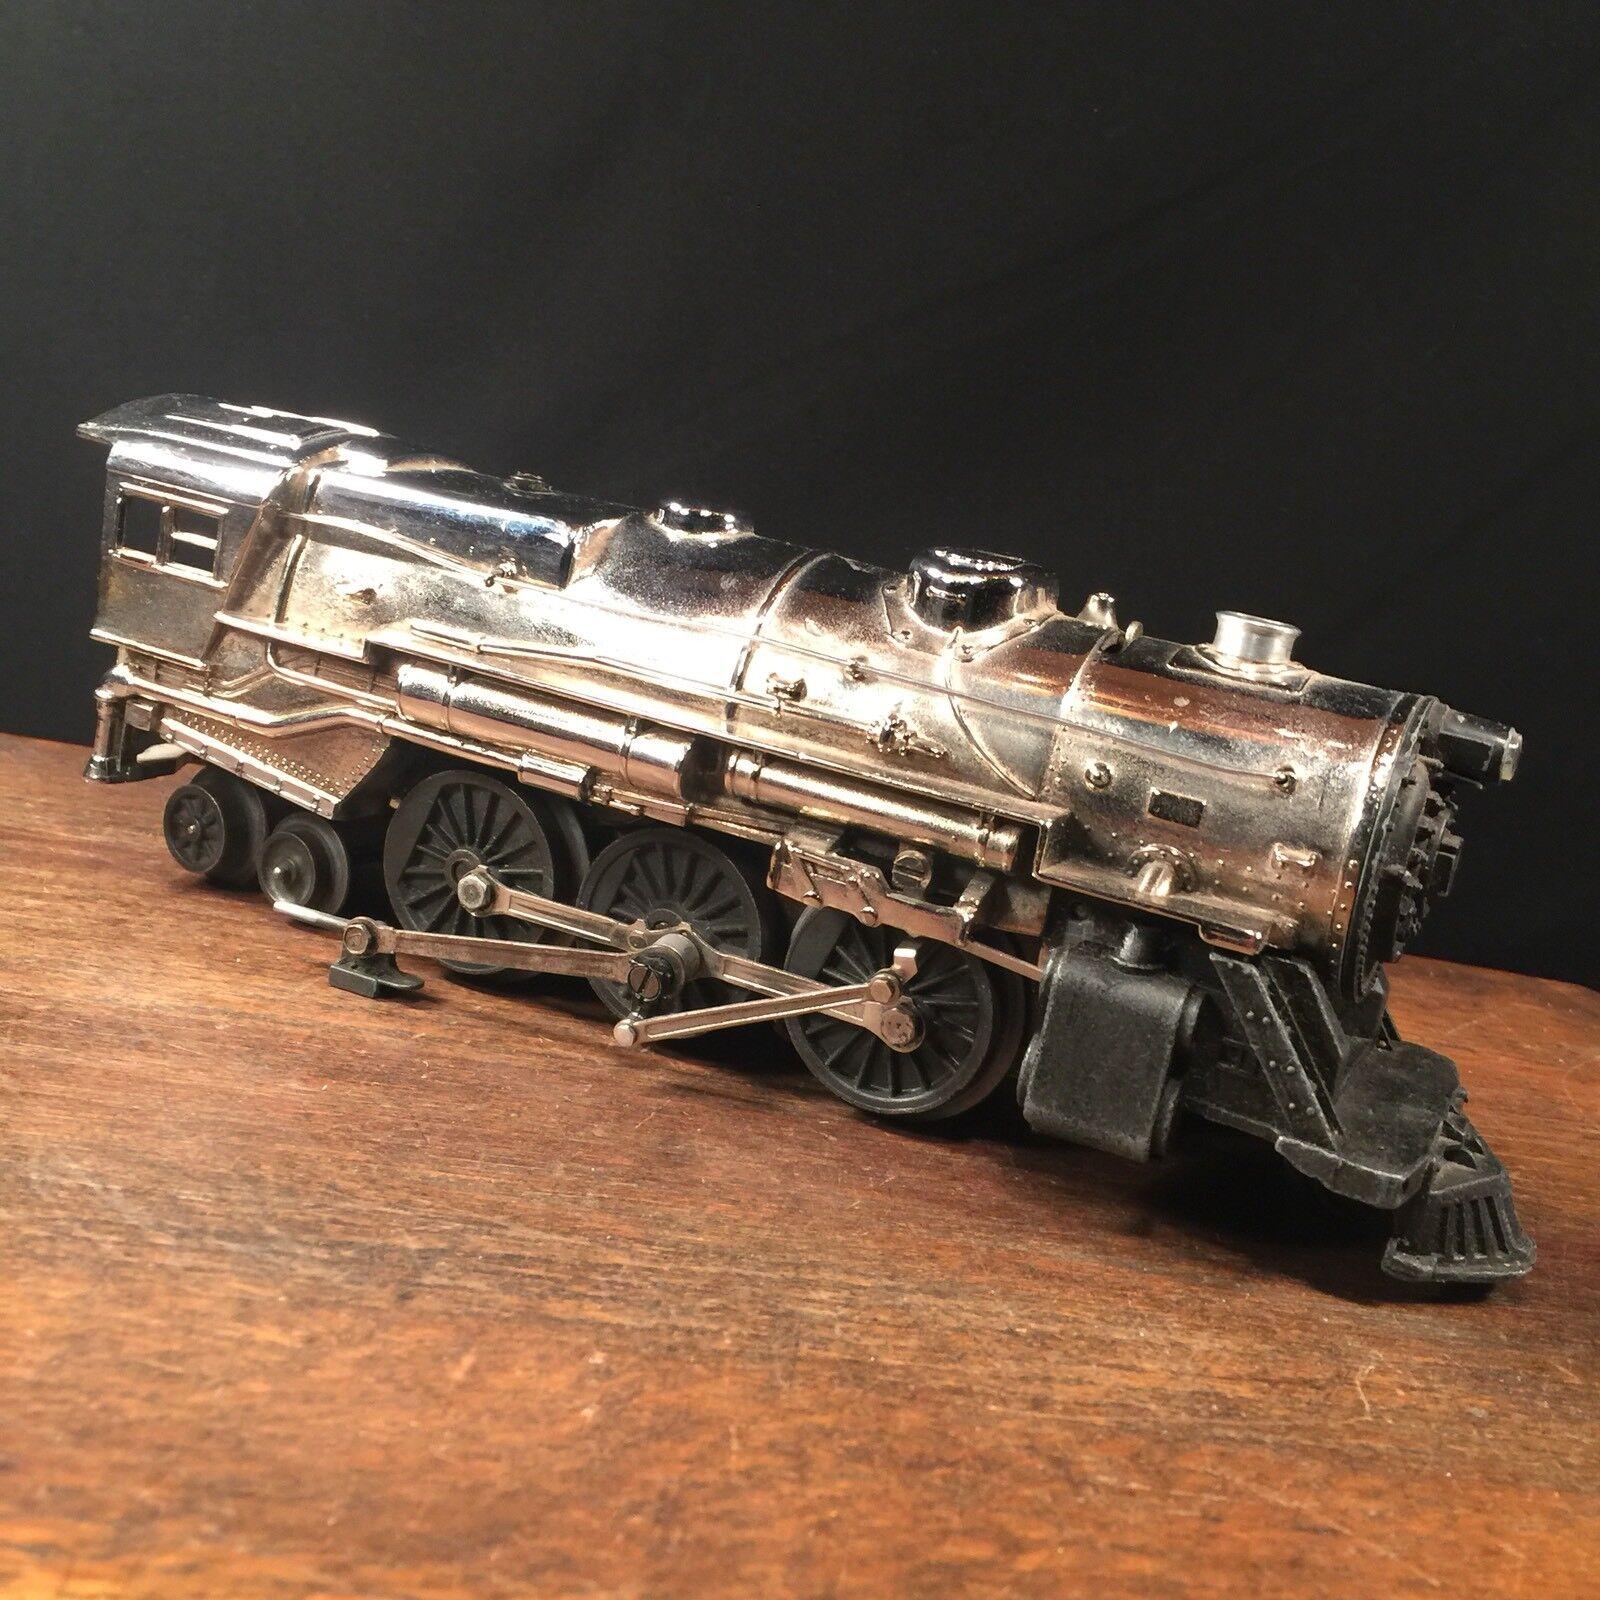 Vintage Lionel Train Locomotive Engine USA 1950s Chrome Plated PRIORITY MAIL